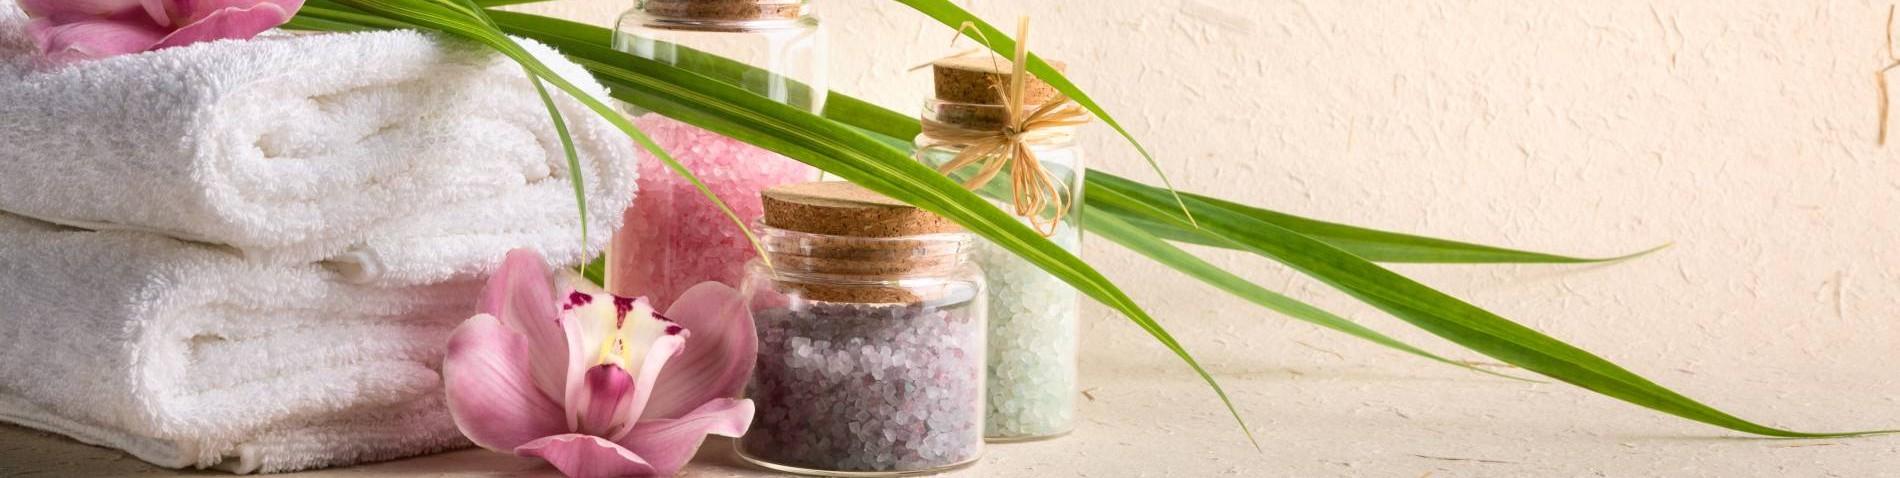 Canterbury spa canterbury massage beauty salon for 5 elements salon